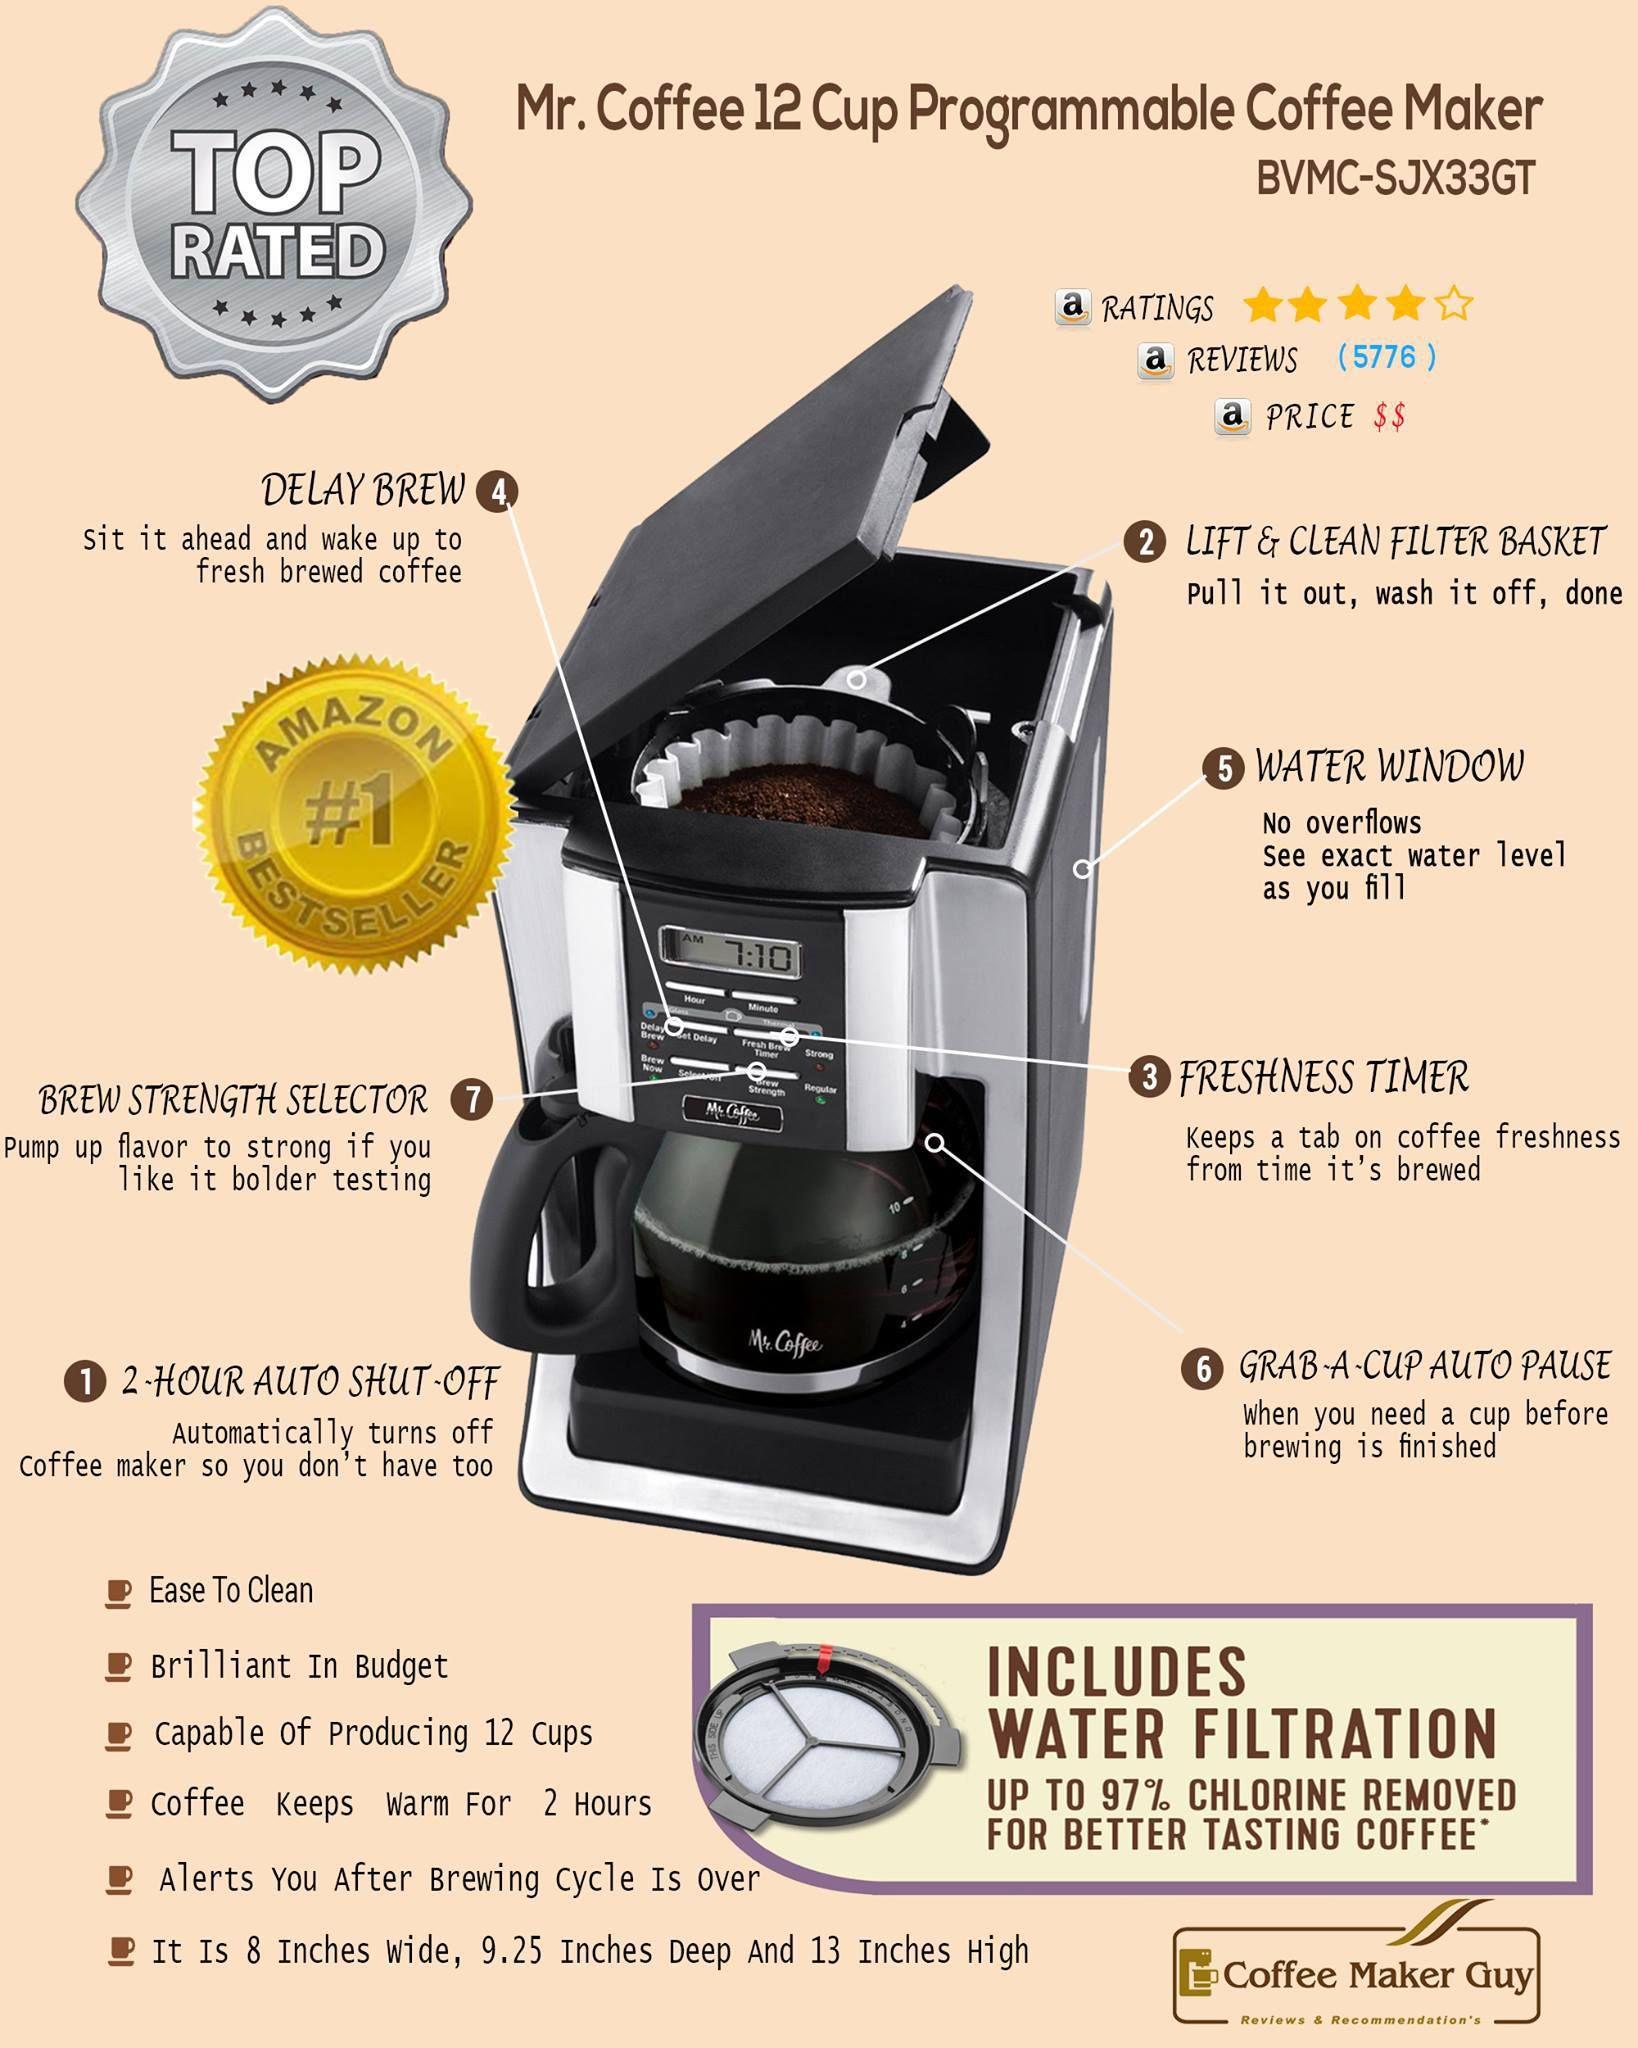 MrCoffee12CupProgramableCoffeeMaker Coffee maker